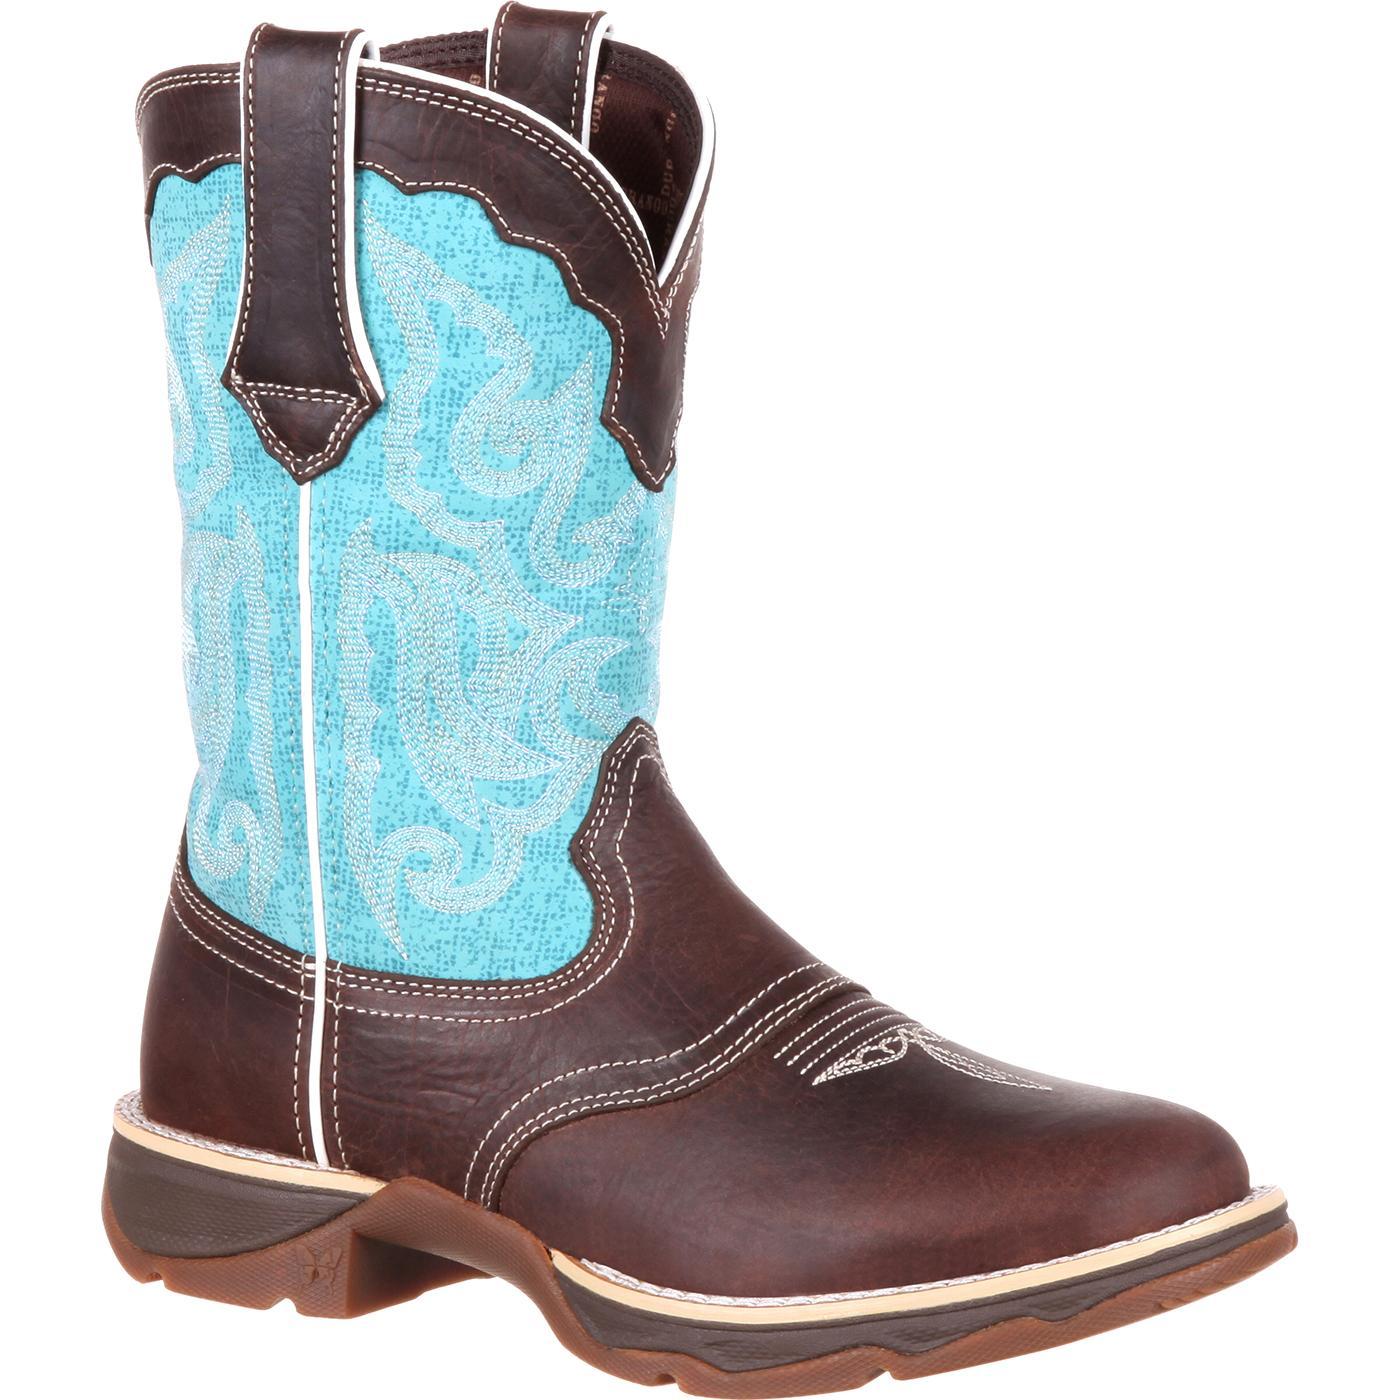 02897ba4041 Lady Rebel by Durango Women's Saddle Western Boot